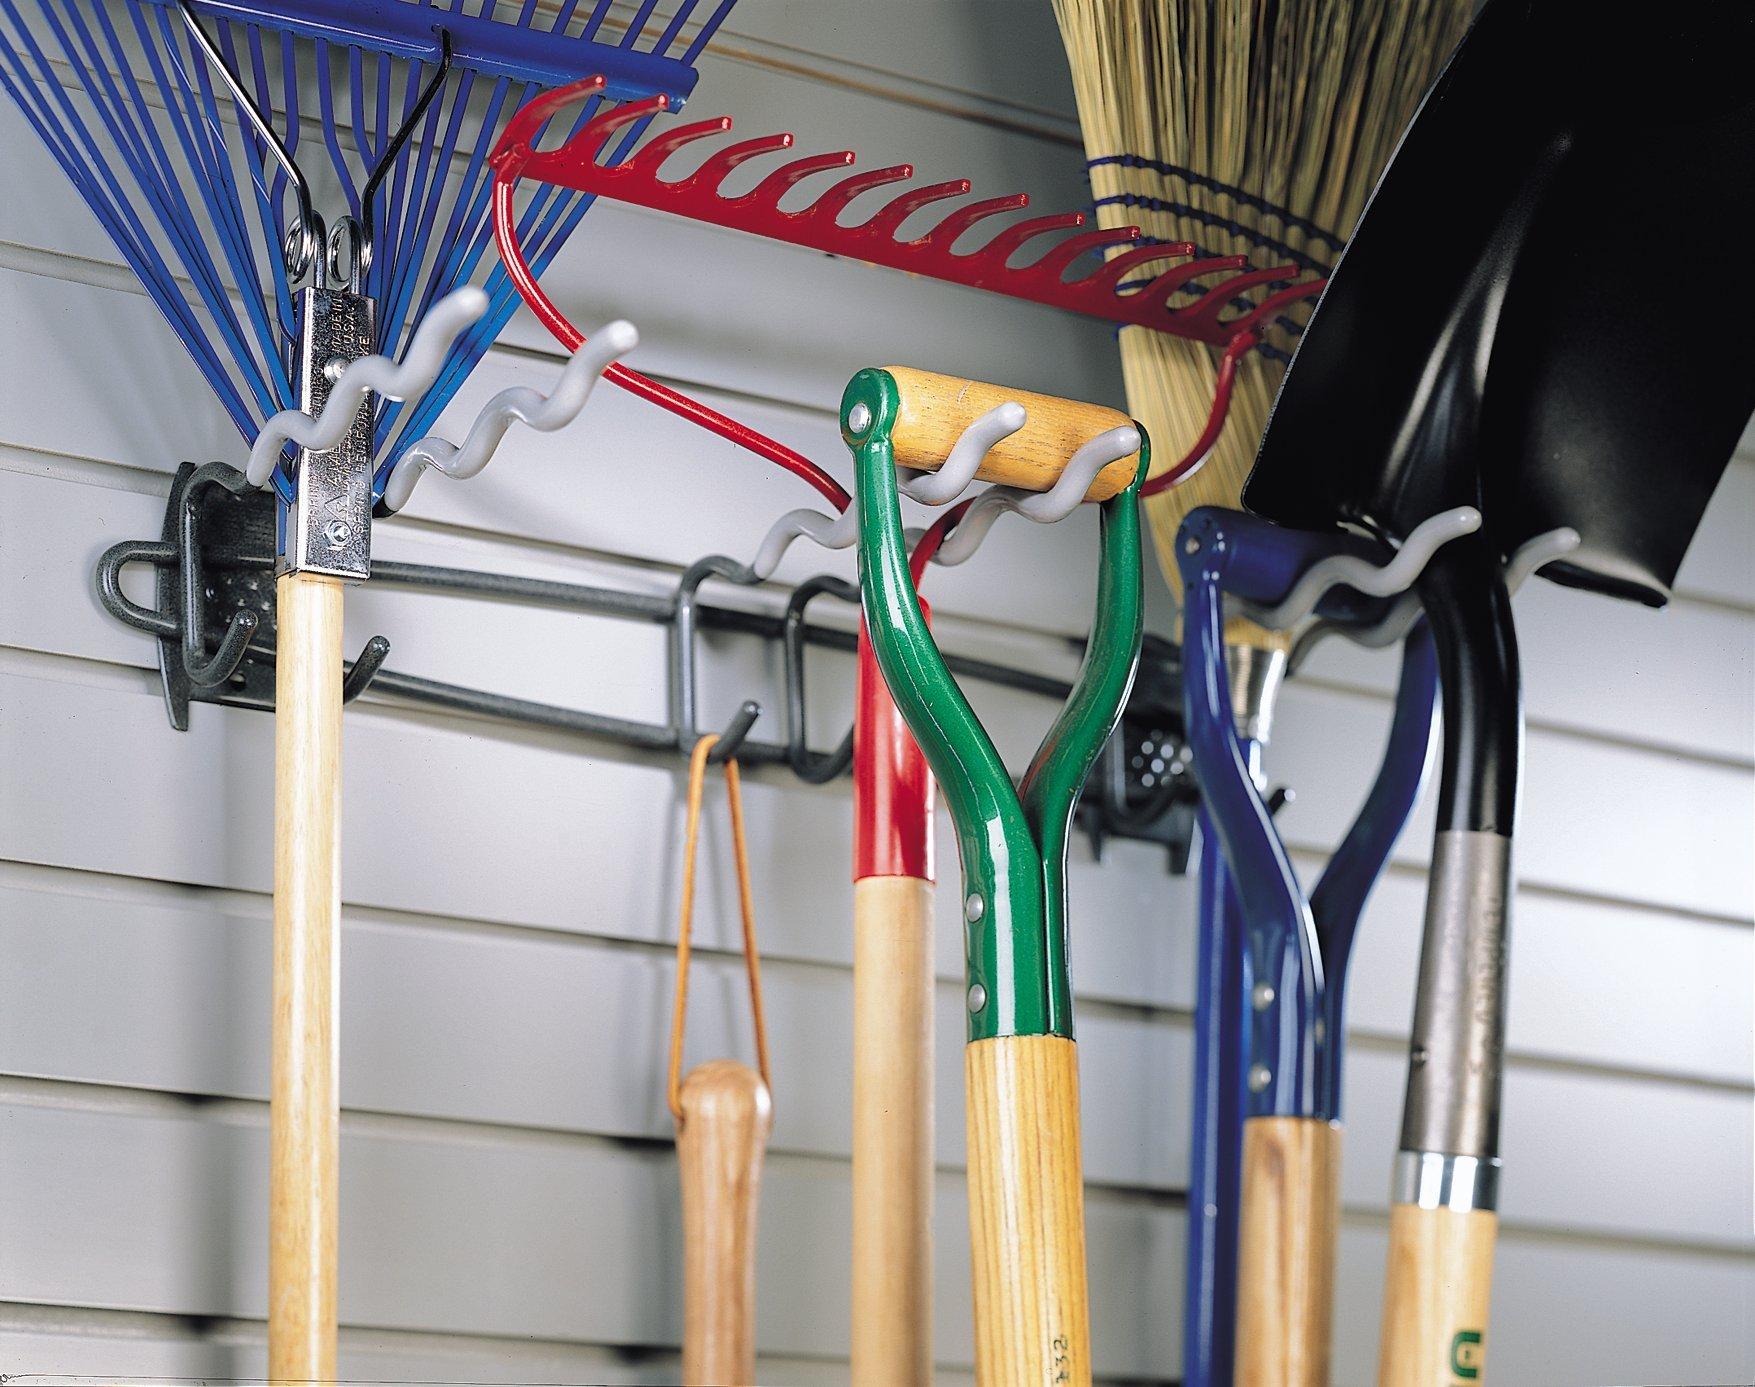 Organized Living Activity Organizer Big Tool Rack by Organized Living (Image #2)